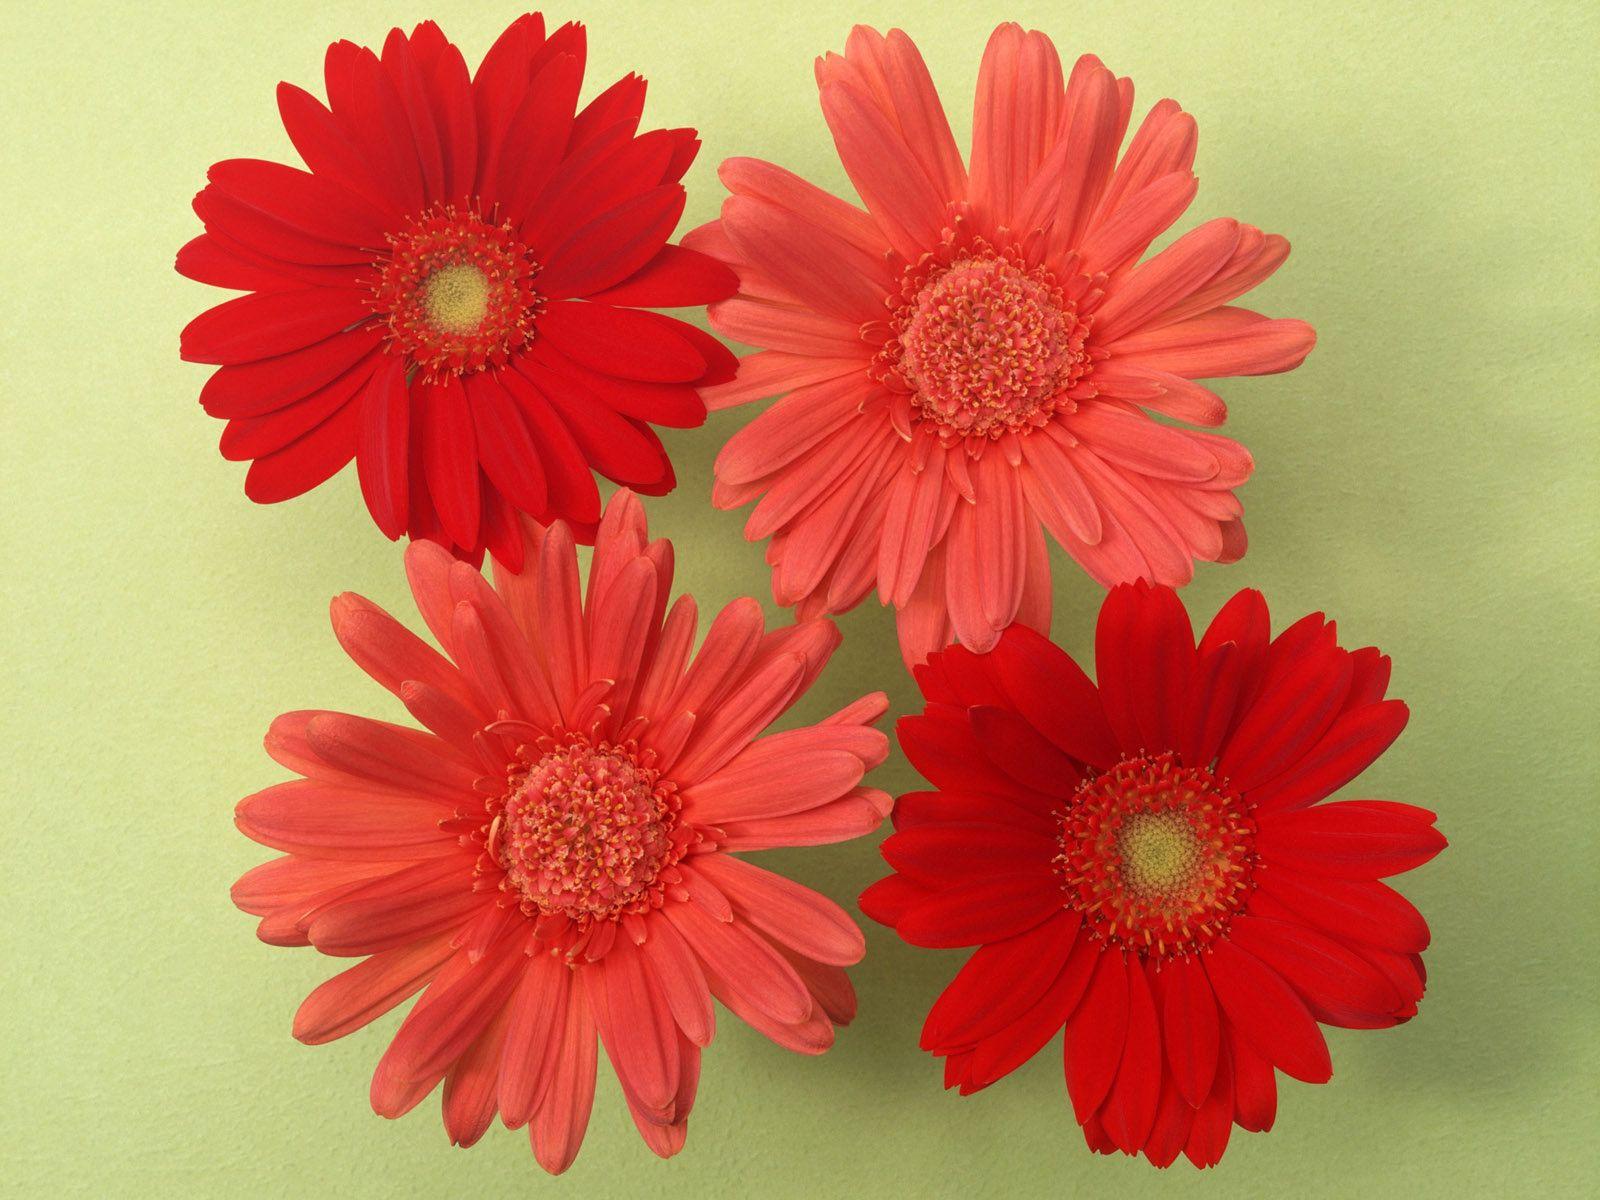 Beautiful flowers free download wallpaper 1200x1600g 16001200 beautiful flowers free download wallpaper 1200x1600g 16001200 izmirmasajfo